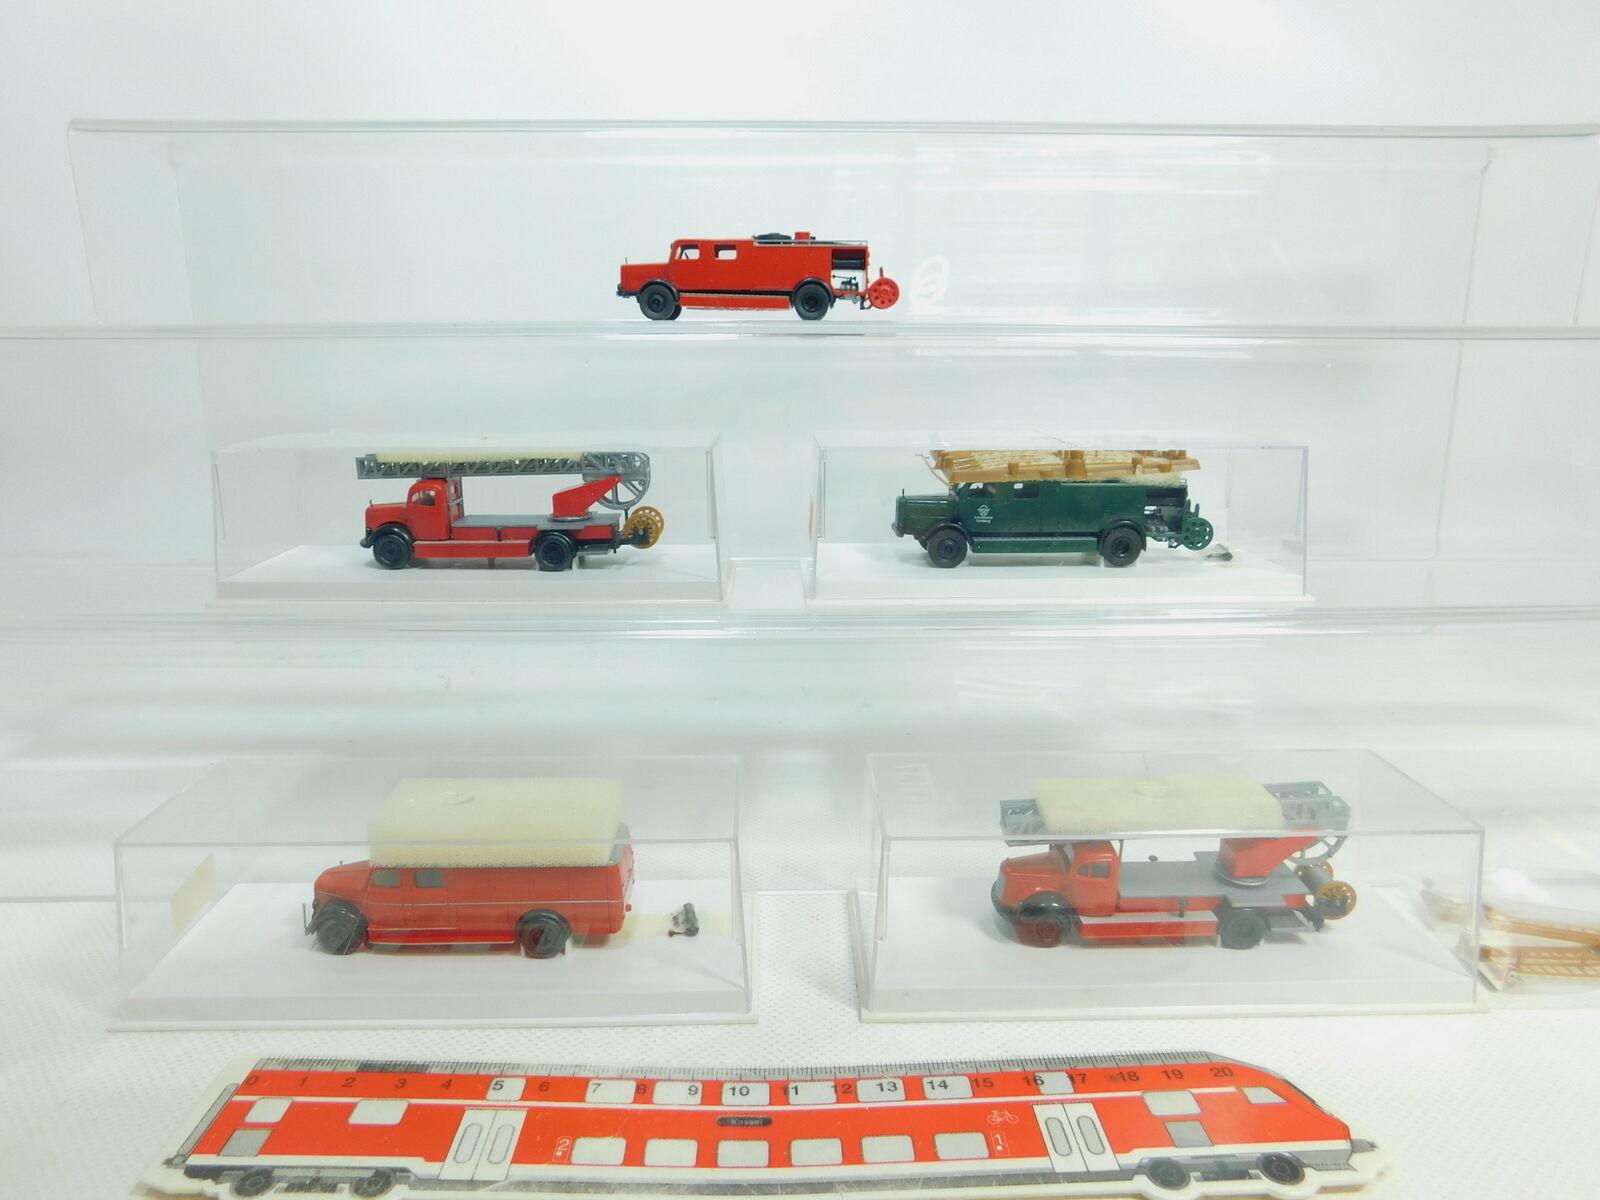 Bn120-0, 5  5x Brekina h0 1 87 FW - Police-Modèle  4035+4120+4423 etc, top+4x neuf dans sa boîte